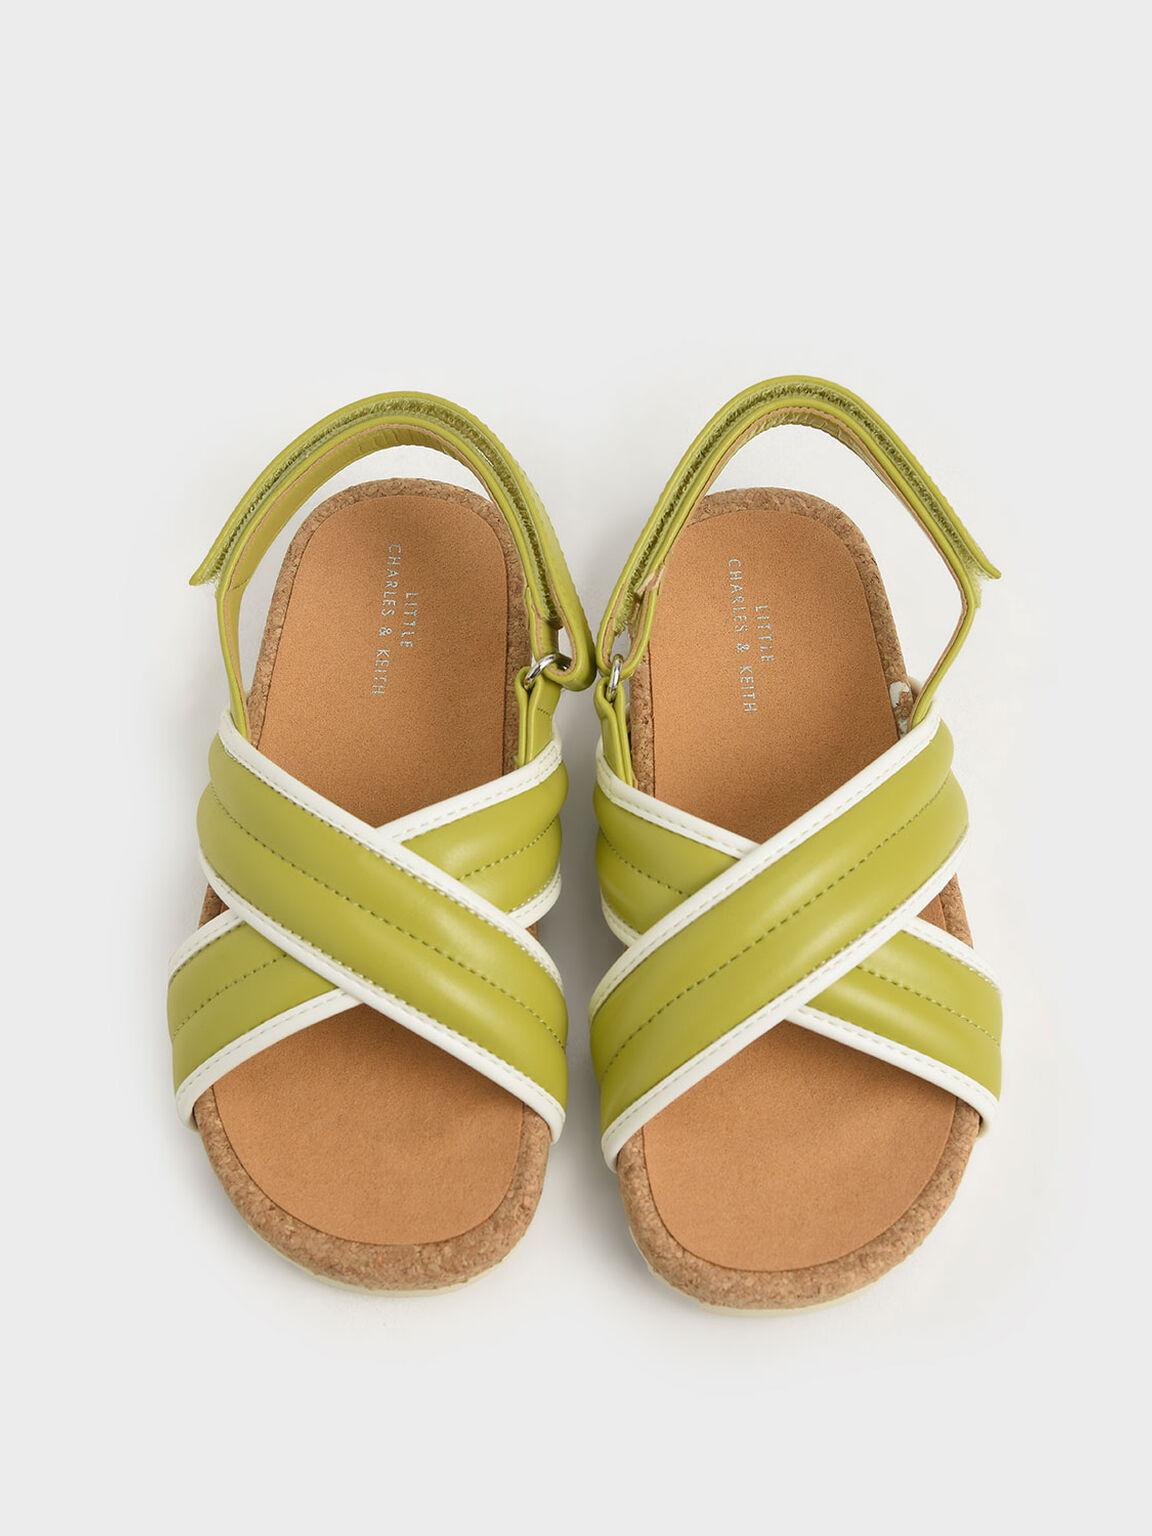 Girls' Criss Cross Sandals, Green, hi-res